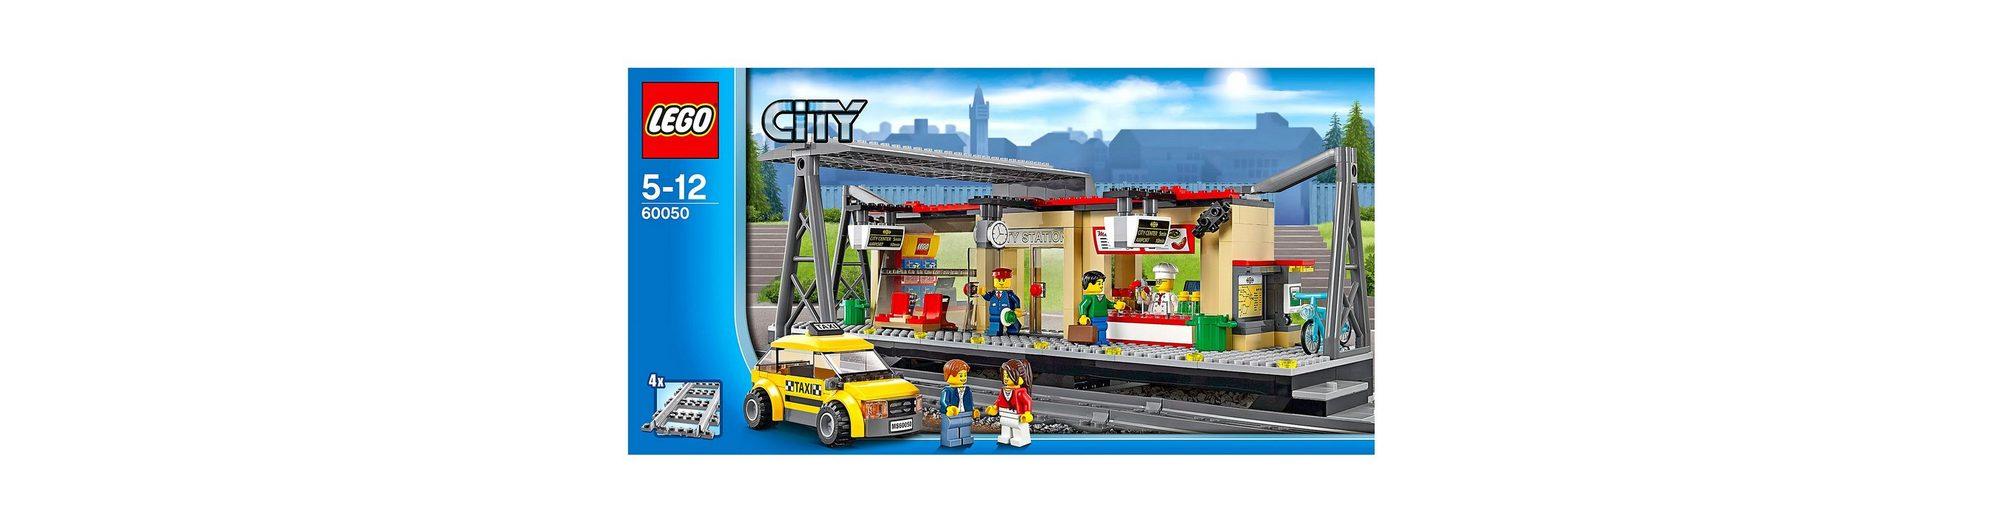 Bahnhof (60050), Lego City, LEGO®